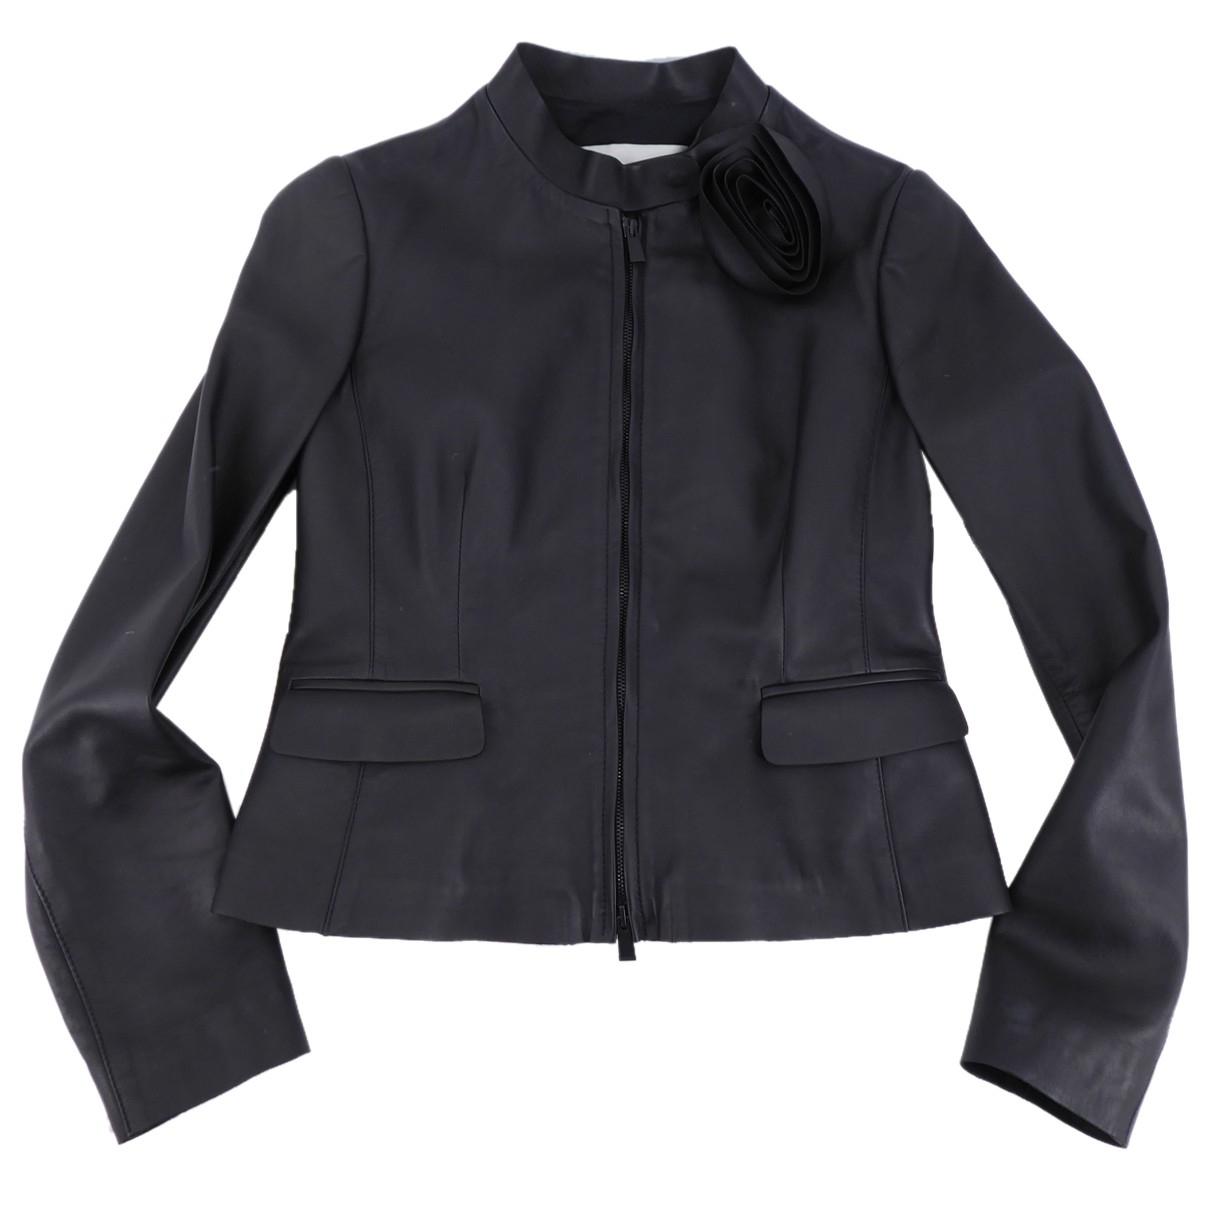 Valentino Garavani \N Black Leather jacket for Women 44 IT